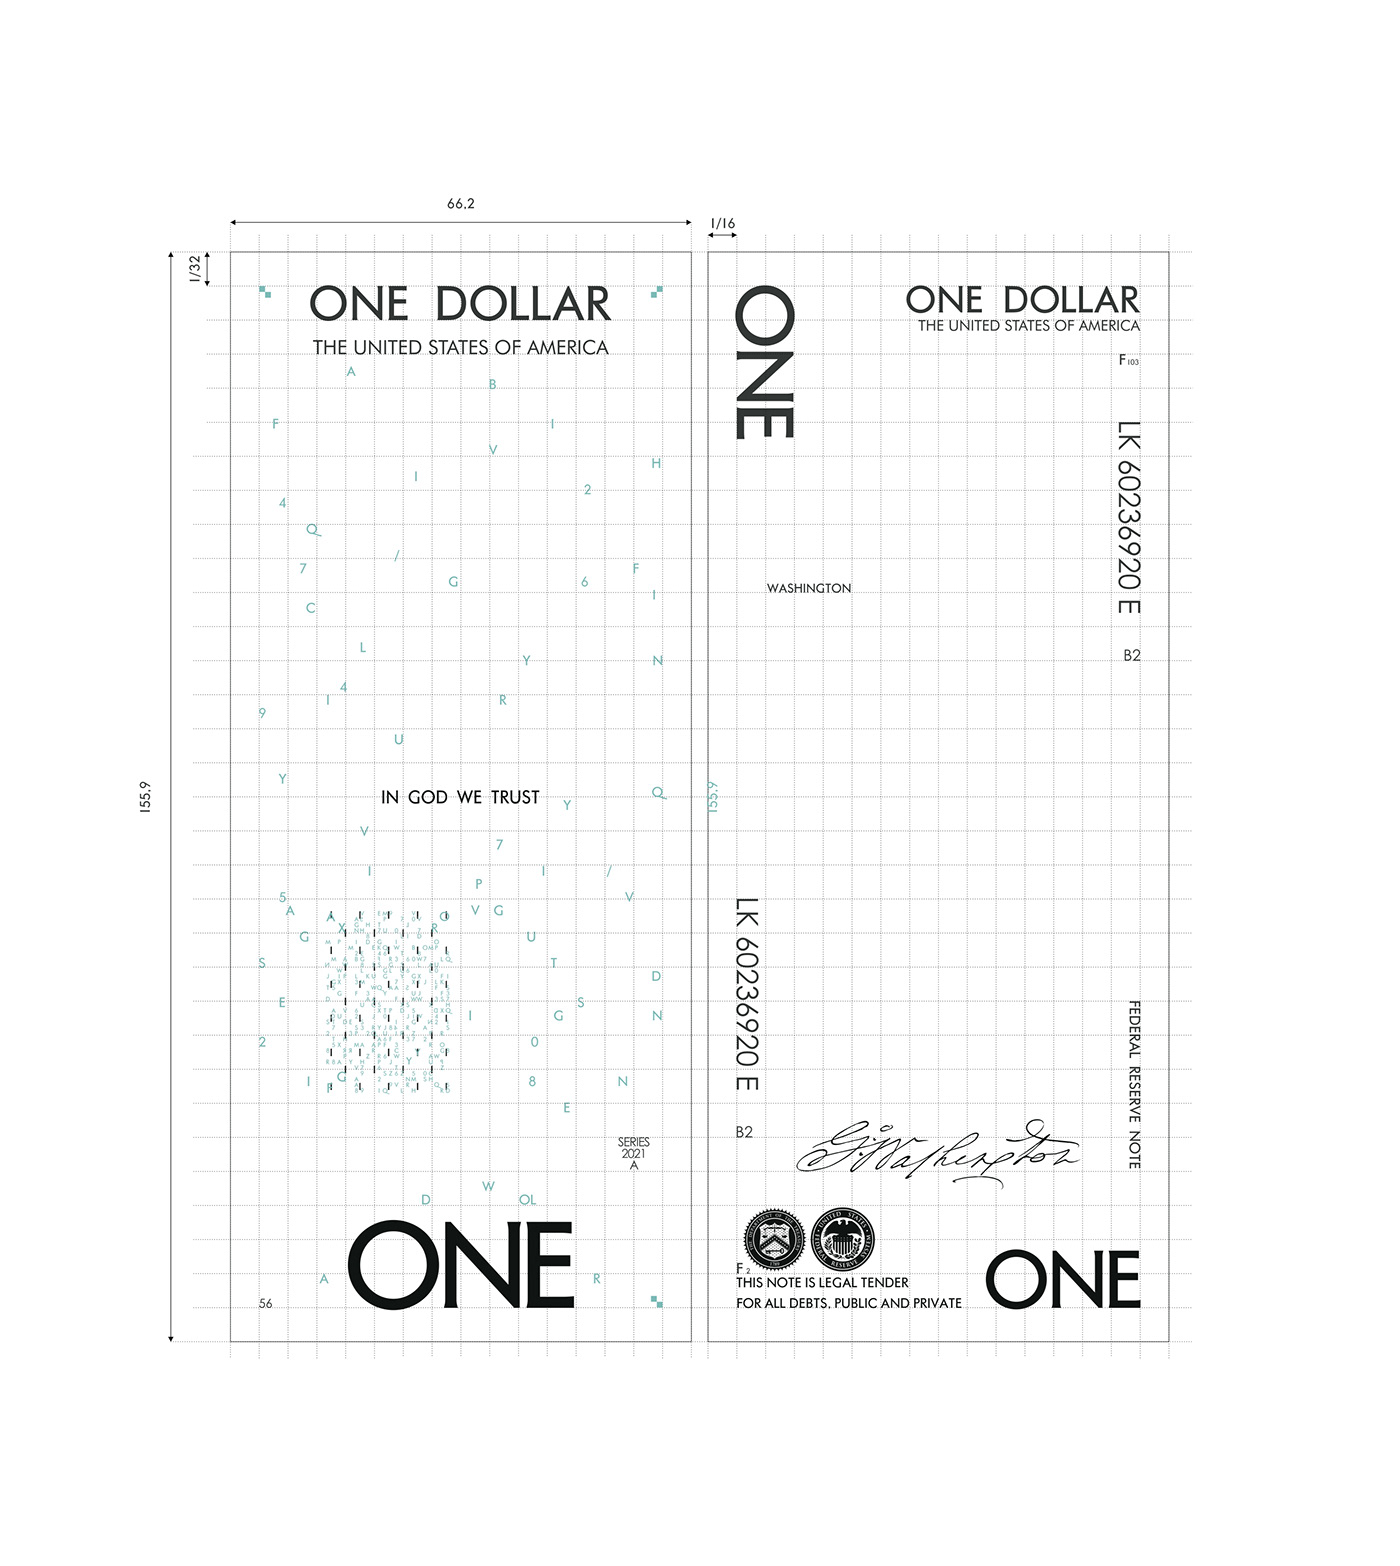 dollar-koncepcio-noko-016.jpg